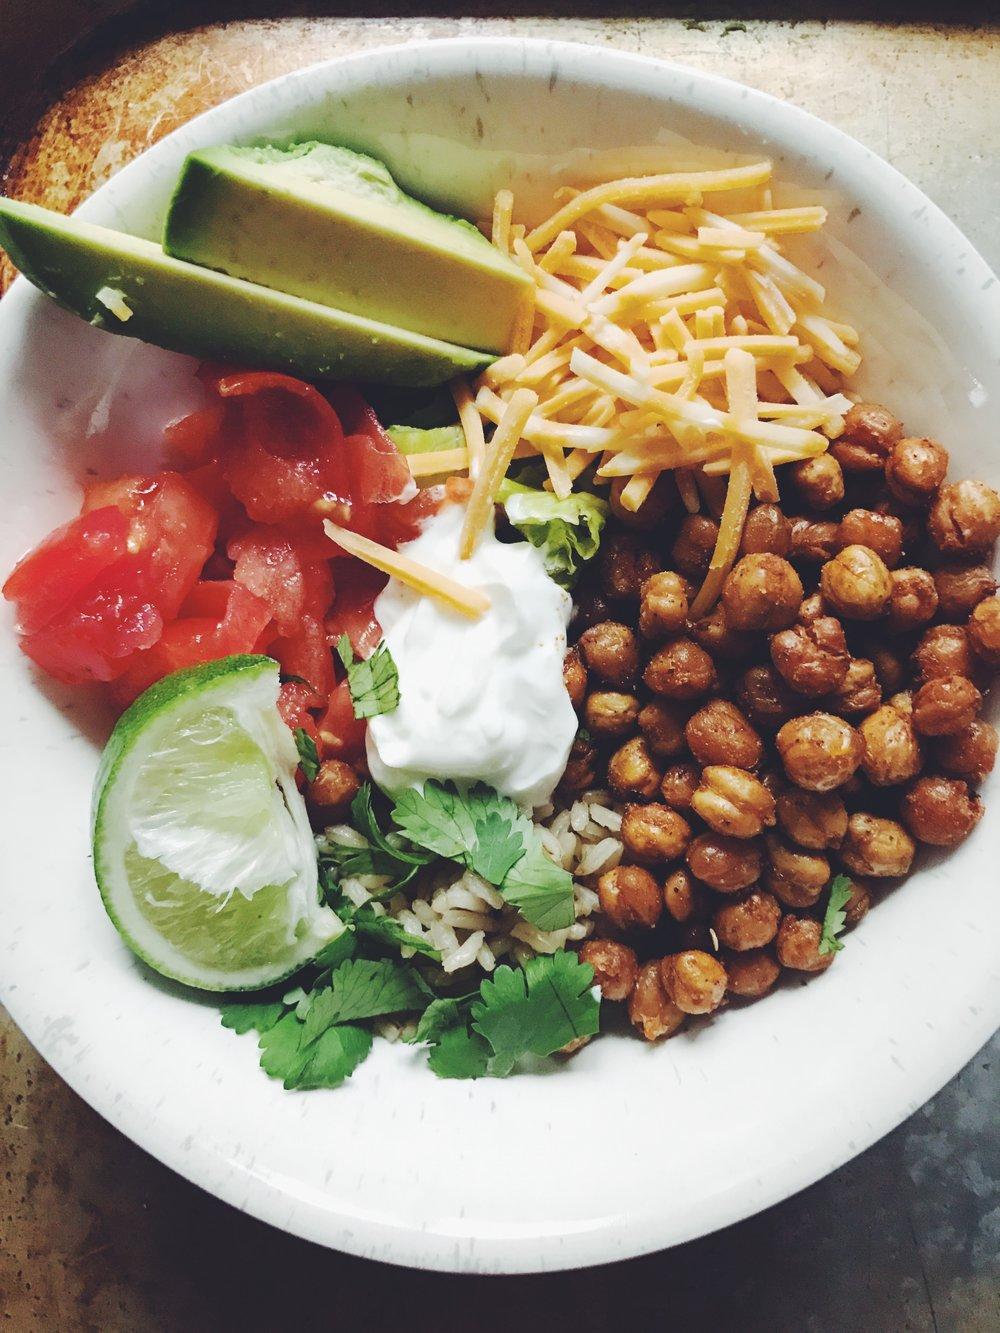 healthy(ish) burrito bowls